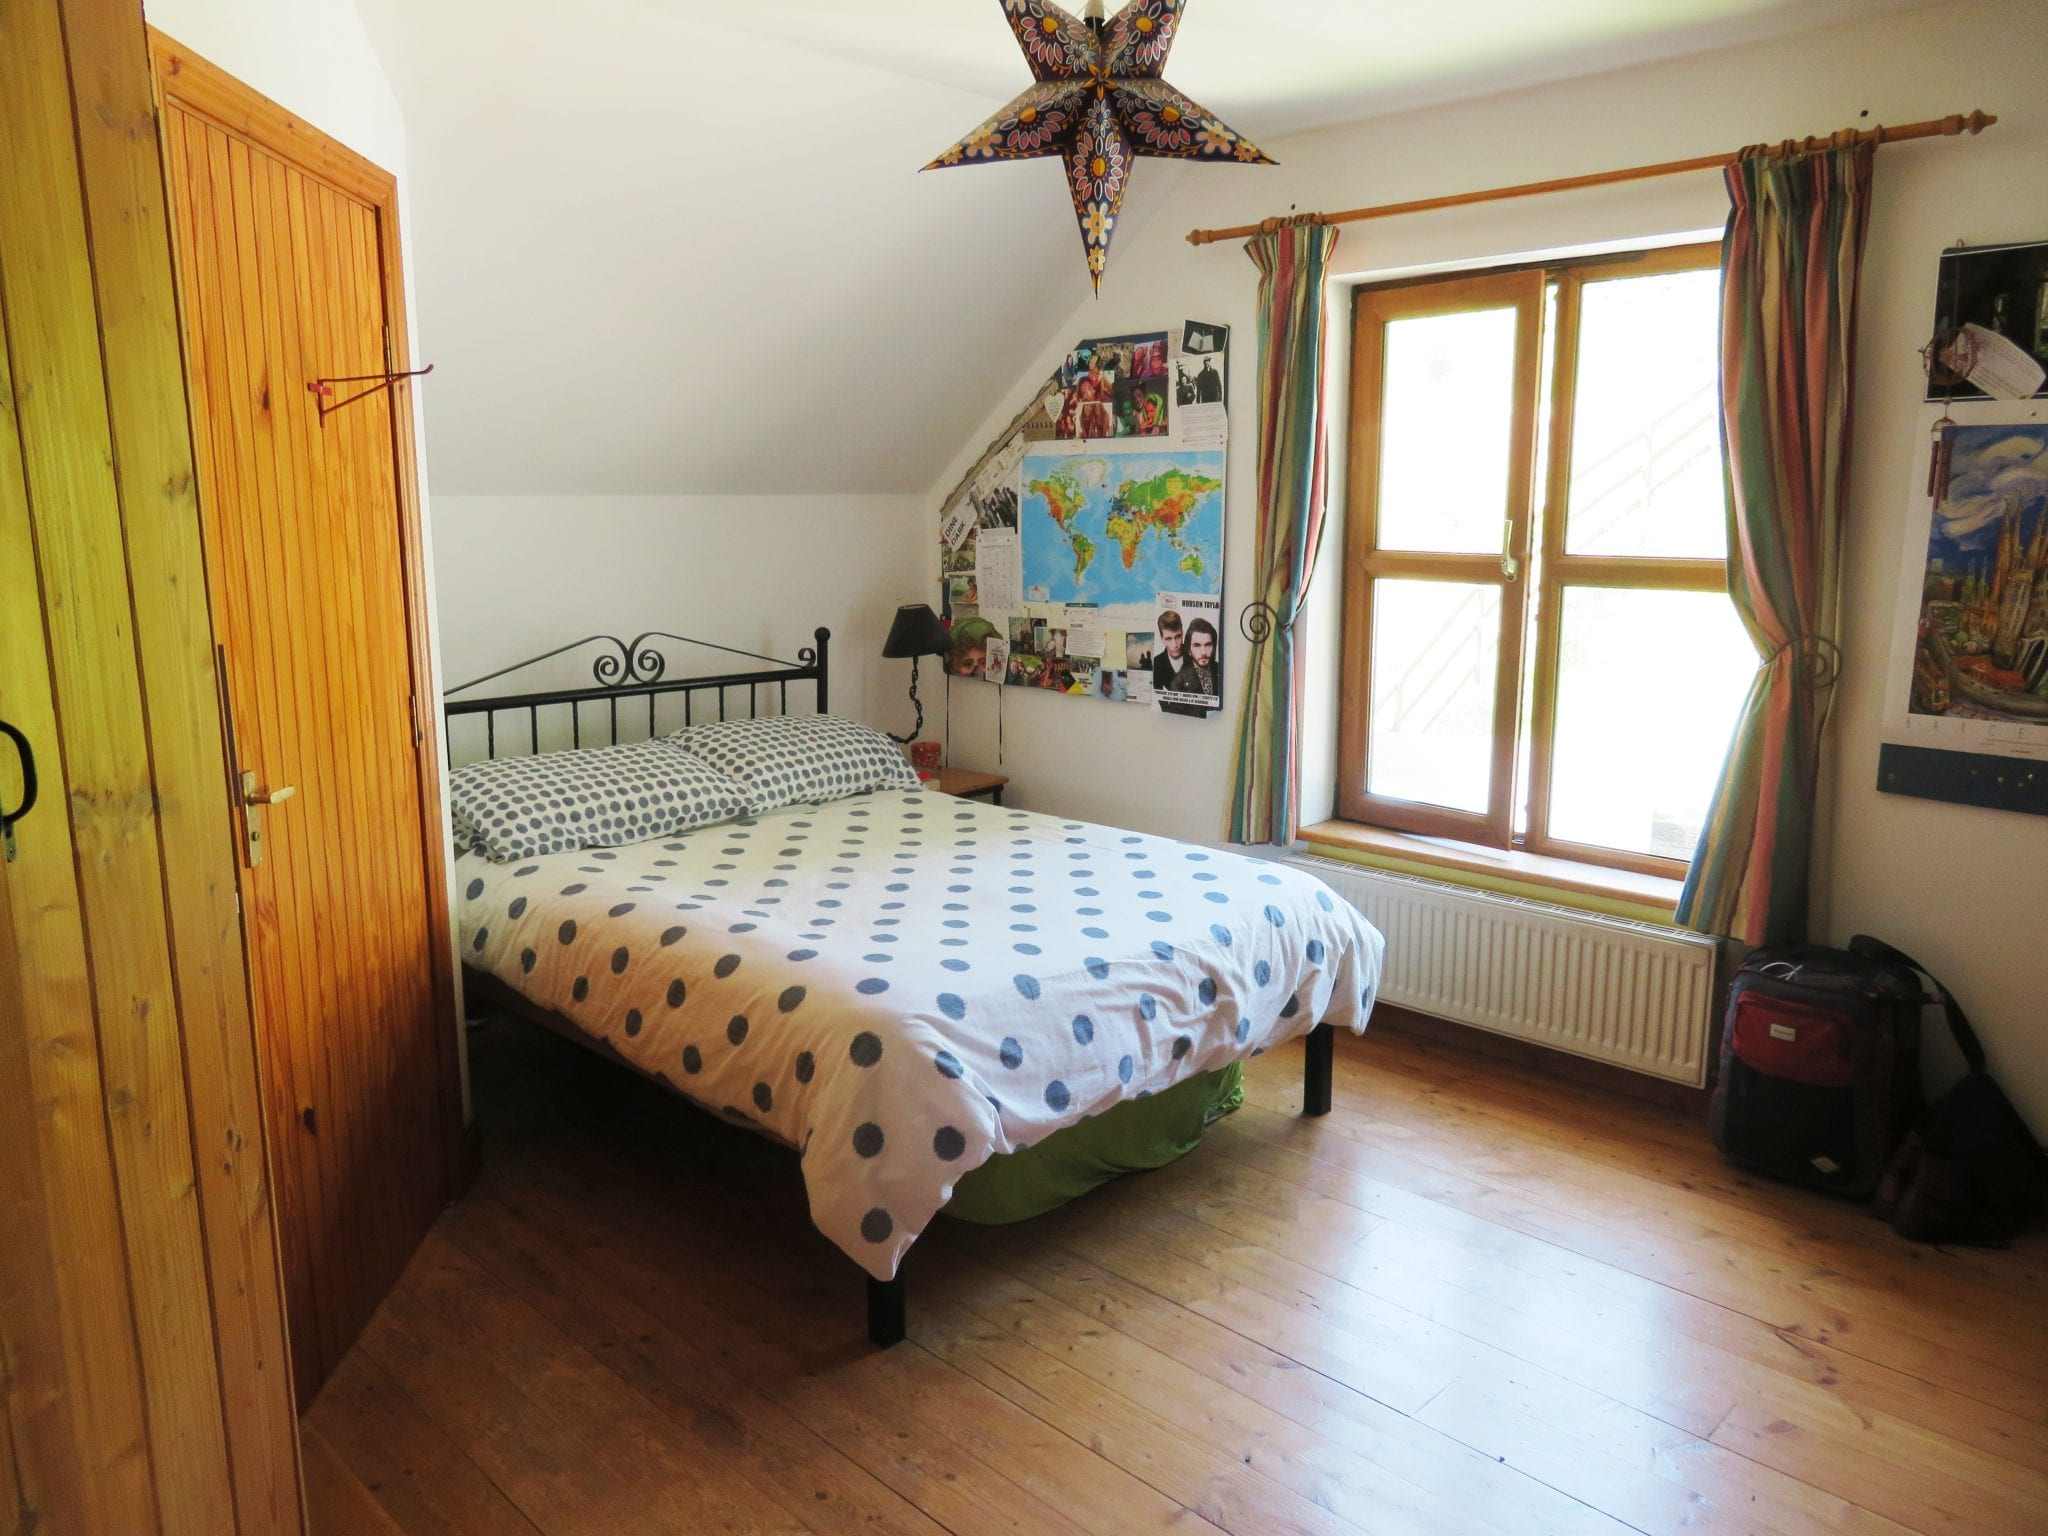 IMG_0017 Bedroom 2